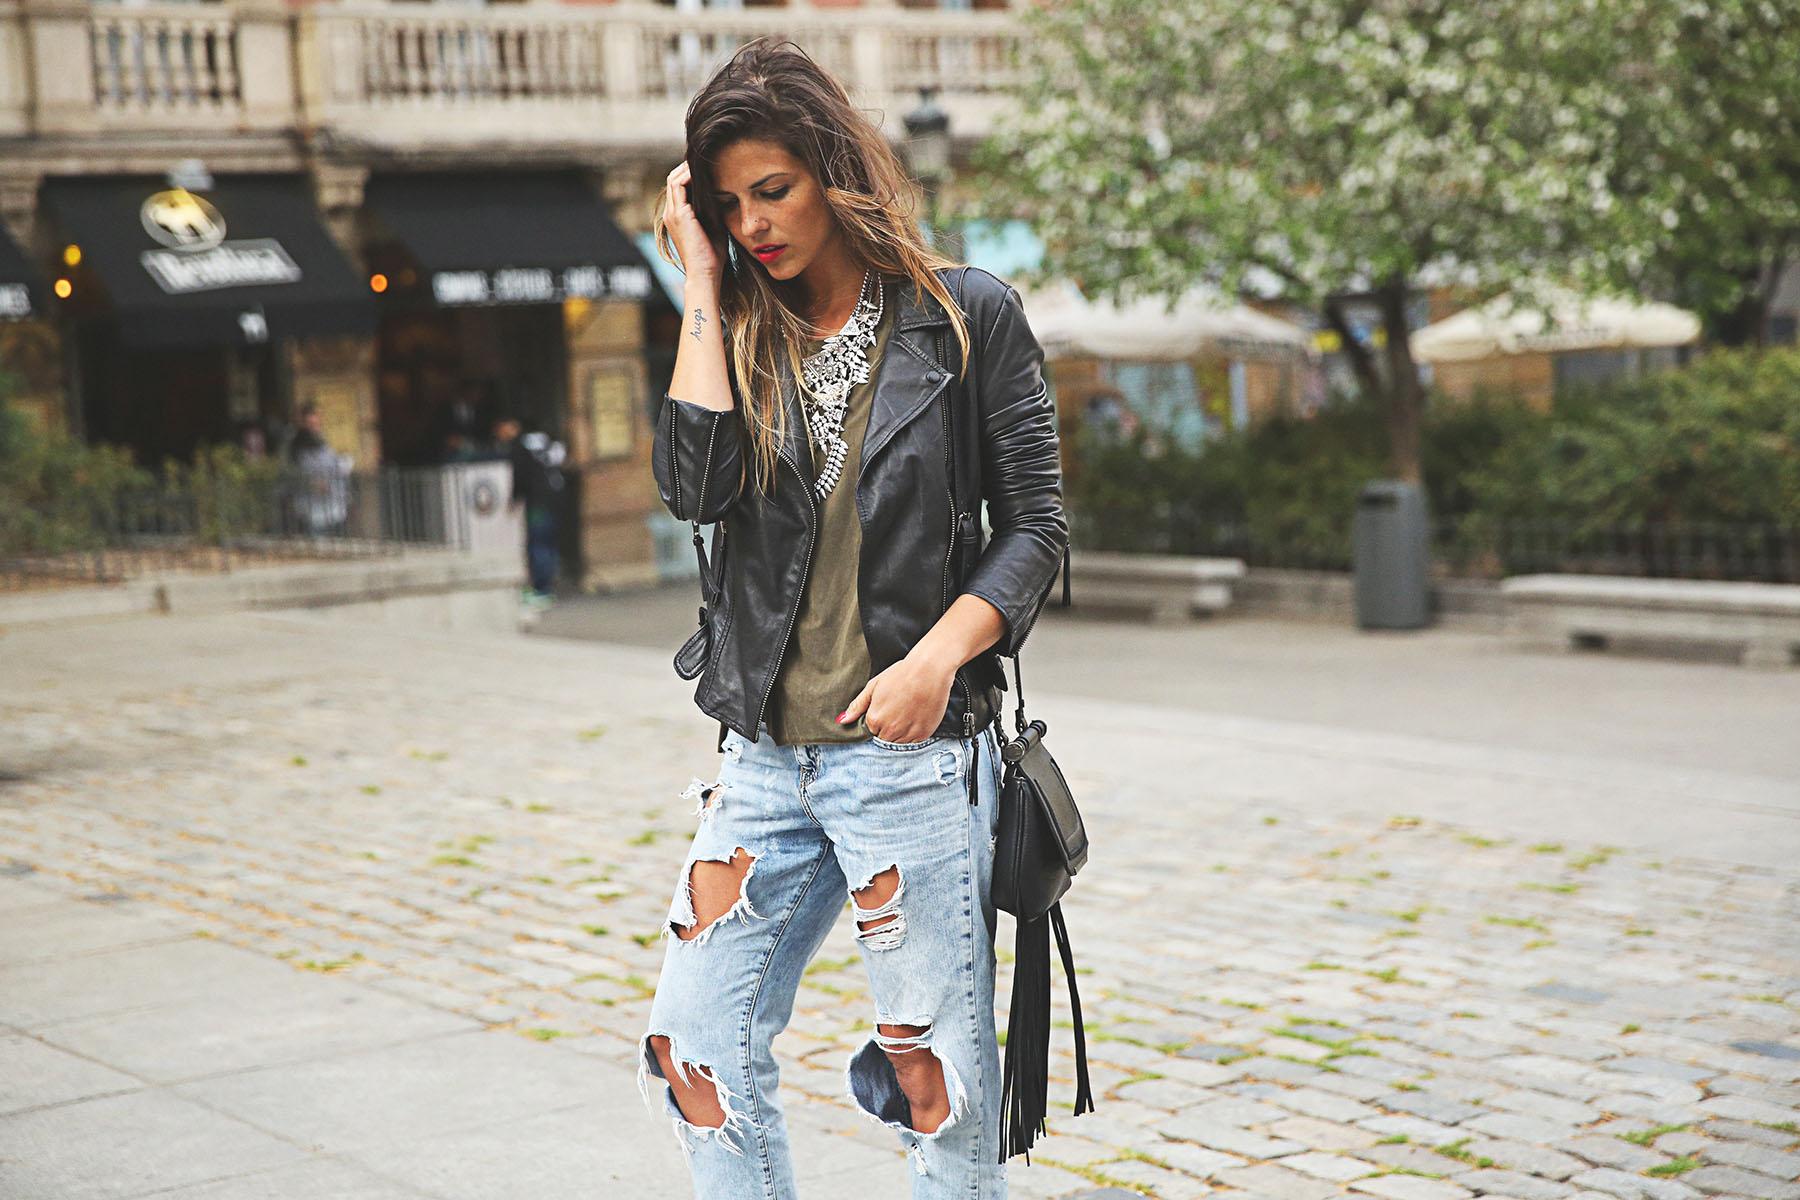 trendy-taste-look-outfit-street-style-ootd-blog-blogger-fashion-spain-moda-españa-boyfriend-vaqueros-jeans-steve-madden-sandalias-verano-primavera-leather-jacket-chaqueta-cuero-khaki-caqui-ripped-rotos-13